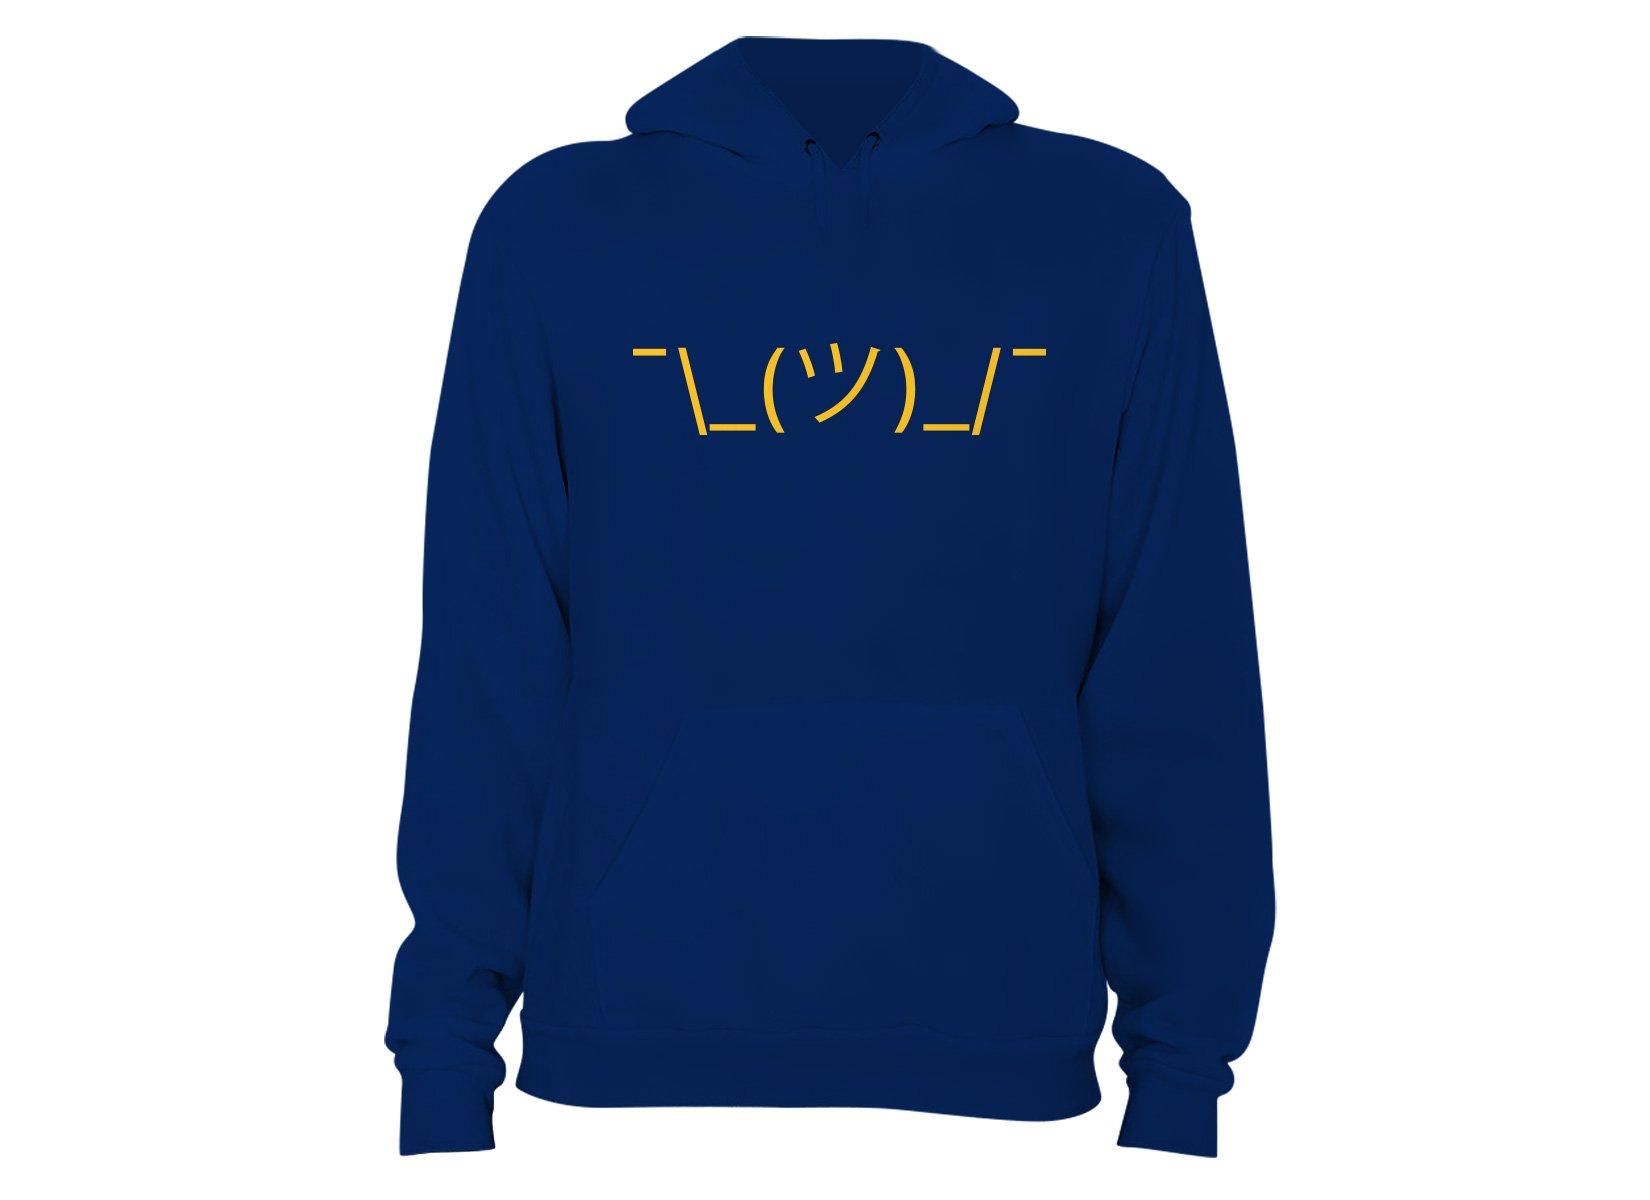 Shrug Emoji on Hoodie